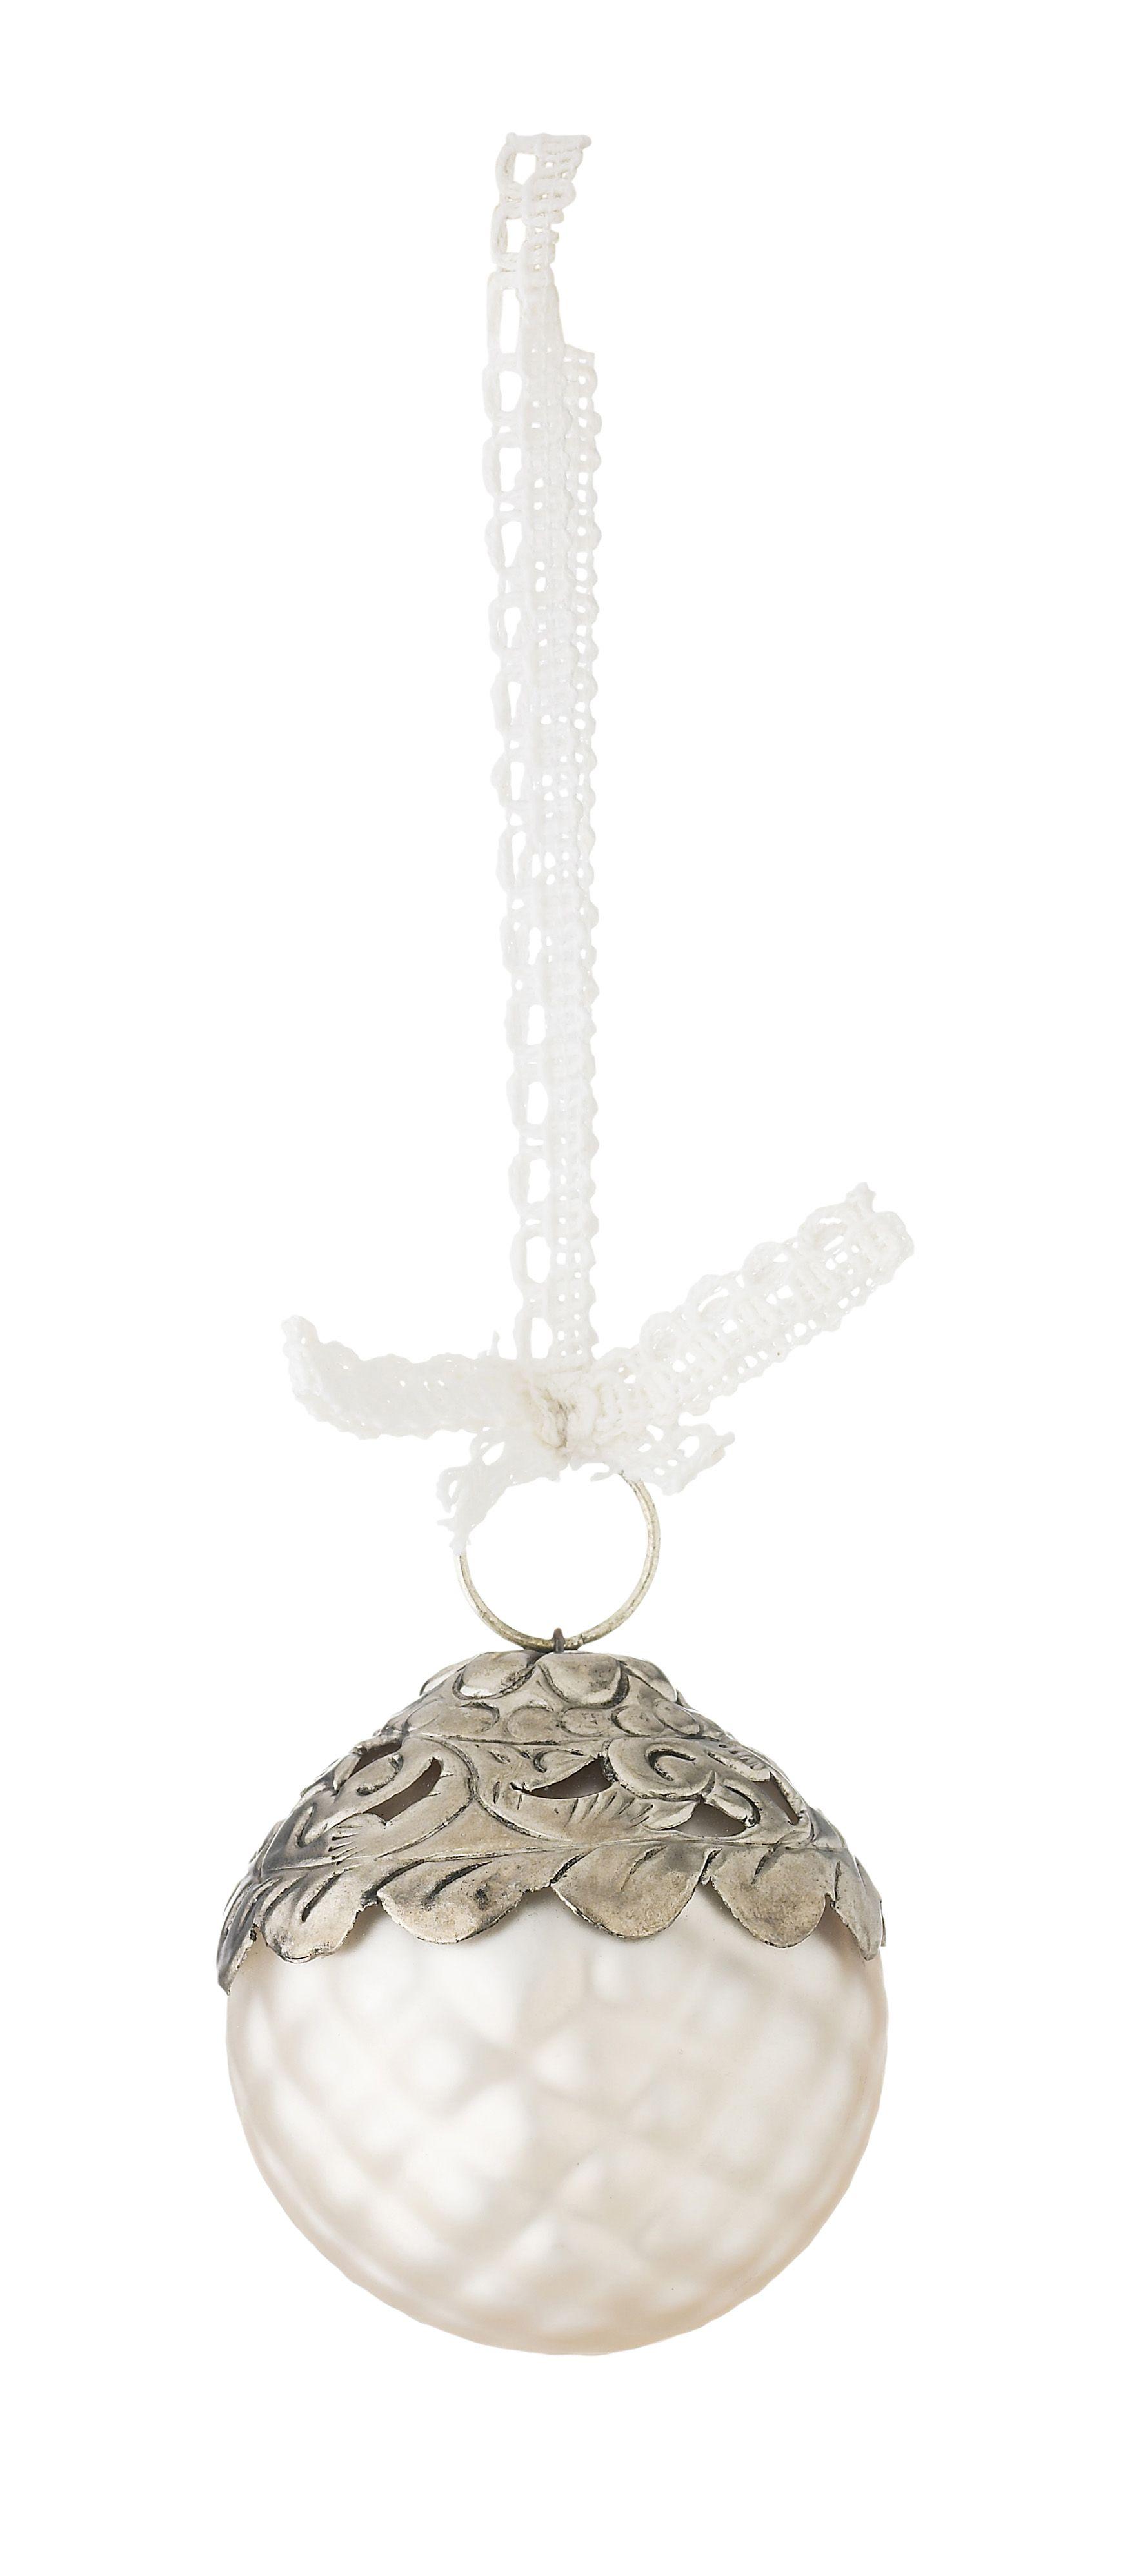 Christmas ornament by Lisbeth Dahl Copenhagen Autumn/Winter 13. #LisbethDahlCph #Magical #Christmas  #Ornament